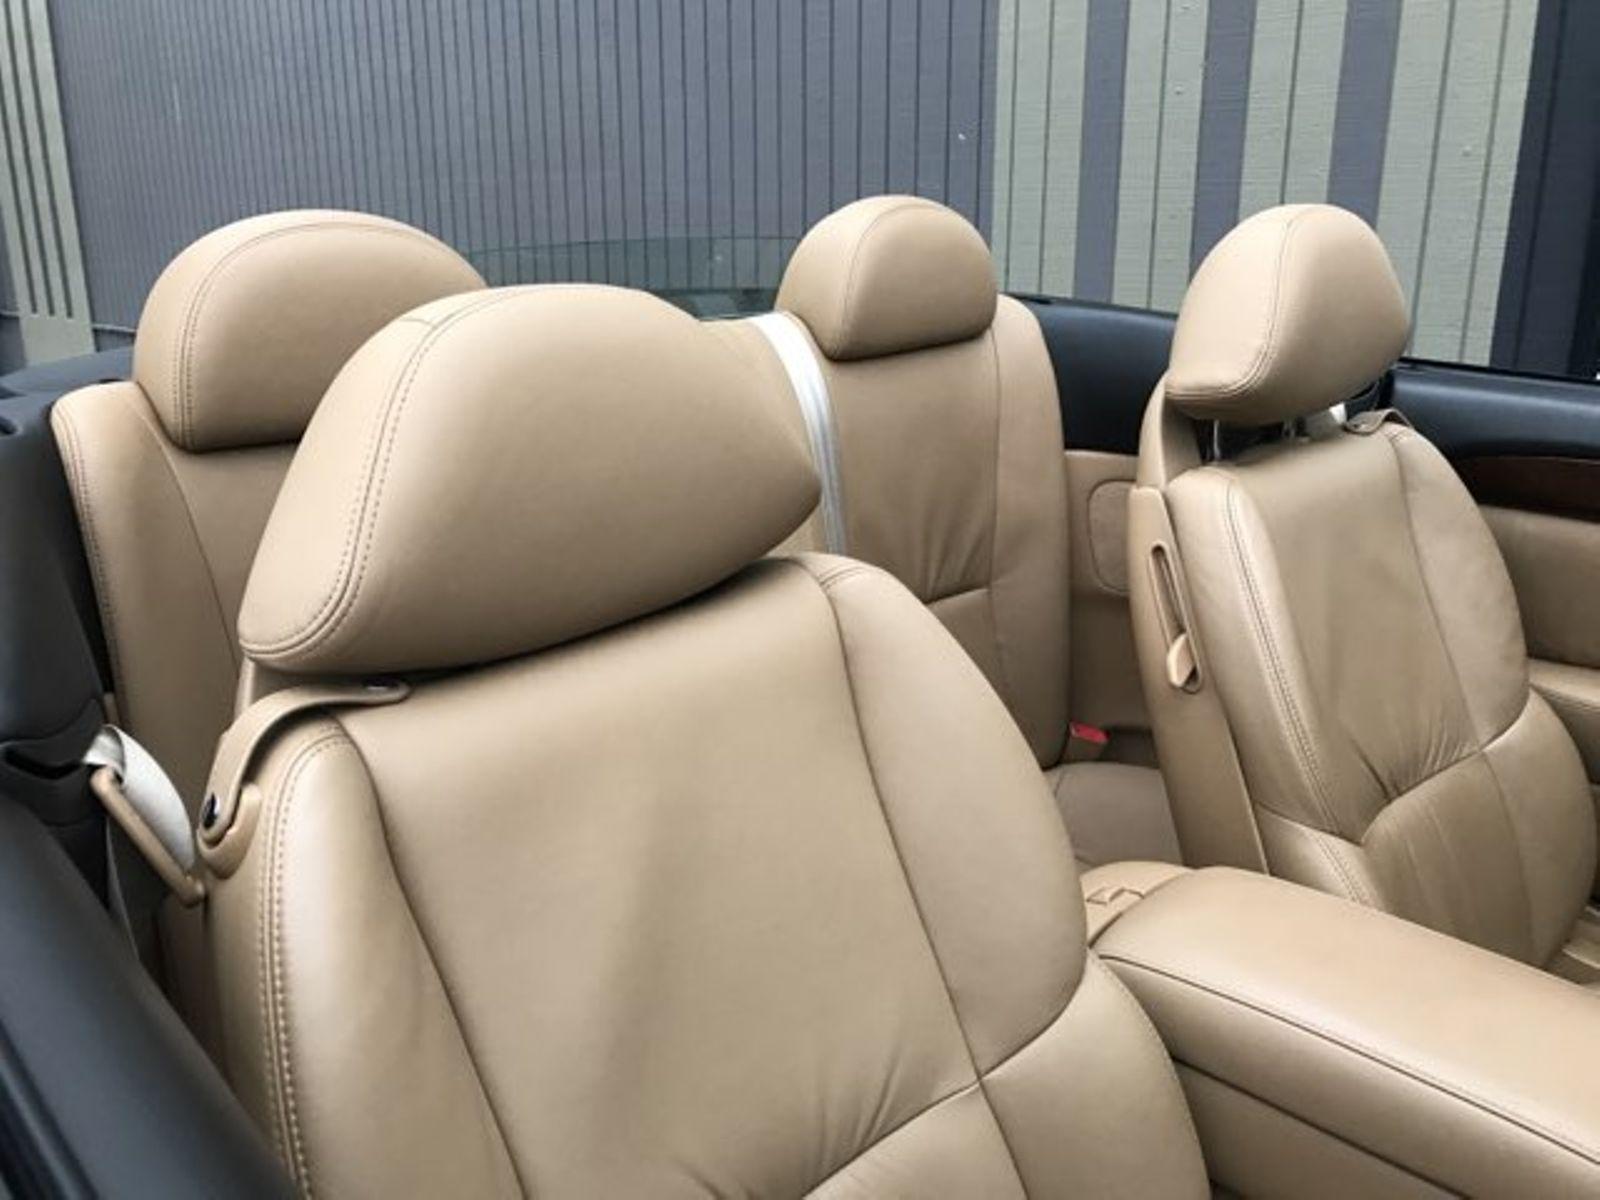 2008 Lexus SC 430 city Washington plete Automotive